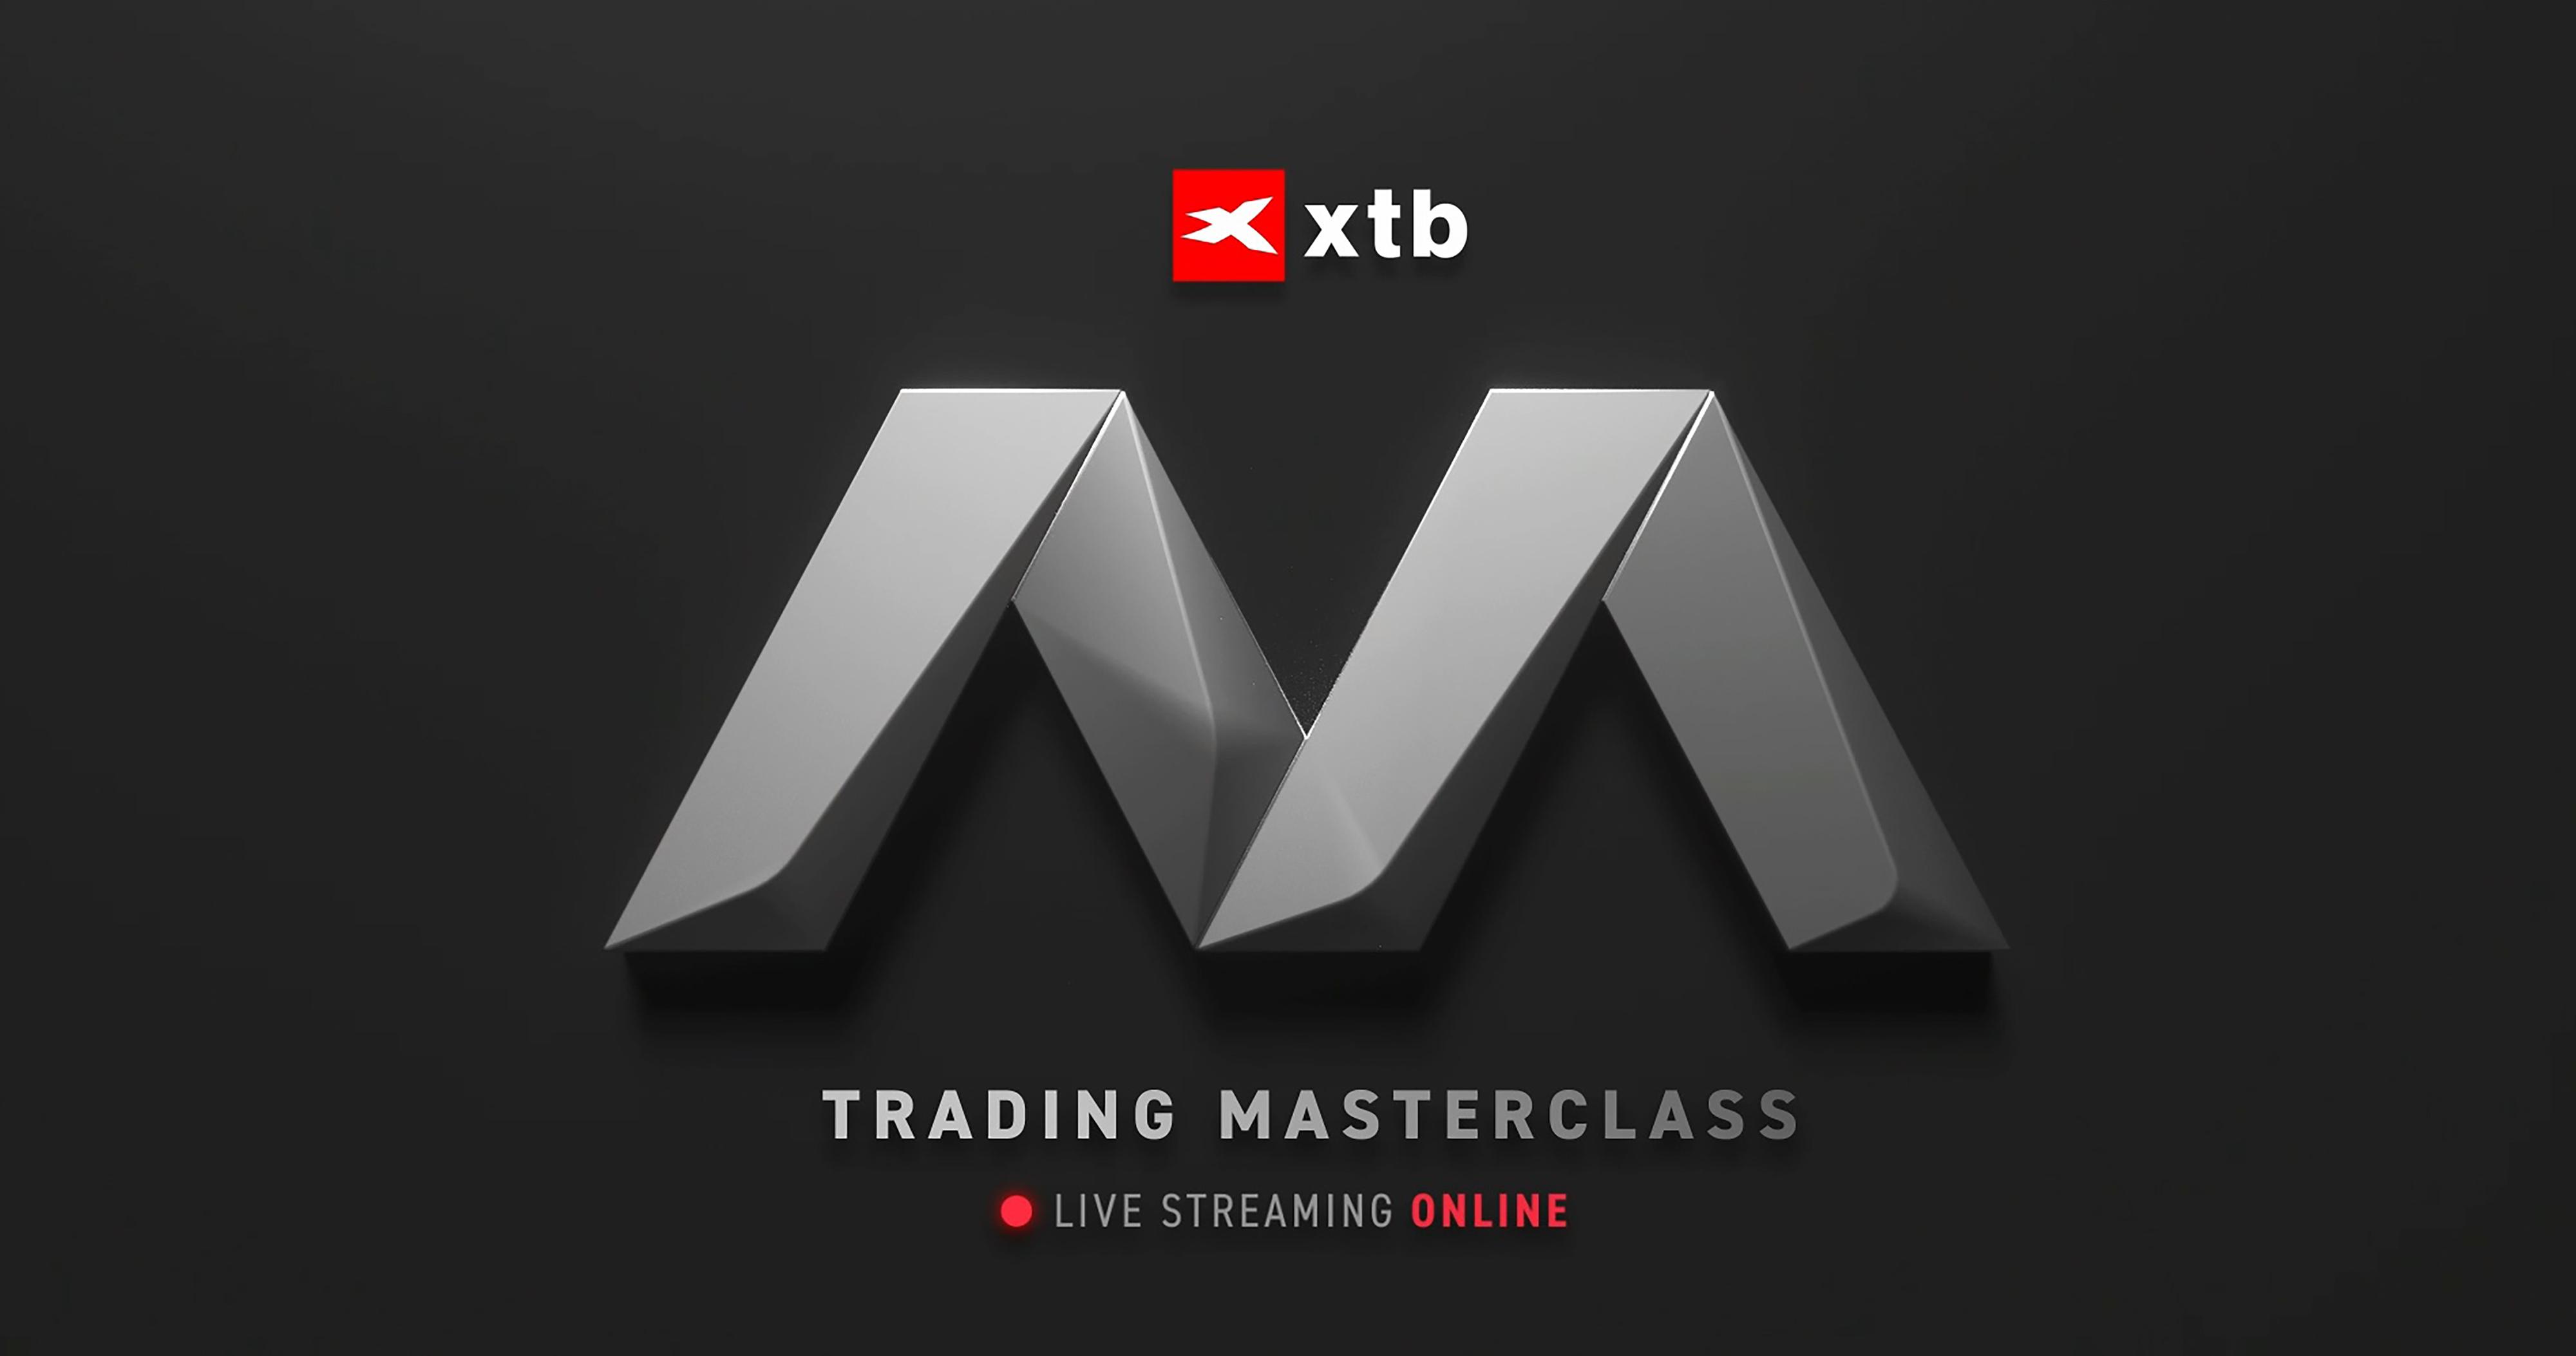 wie man mit binären optionen handel macht trading event 2021 xtb masterclass